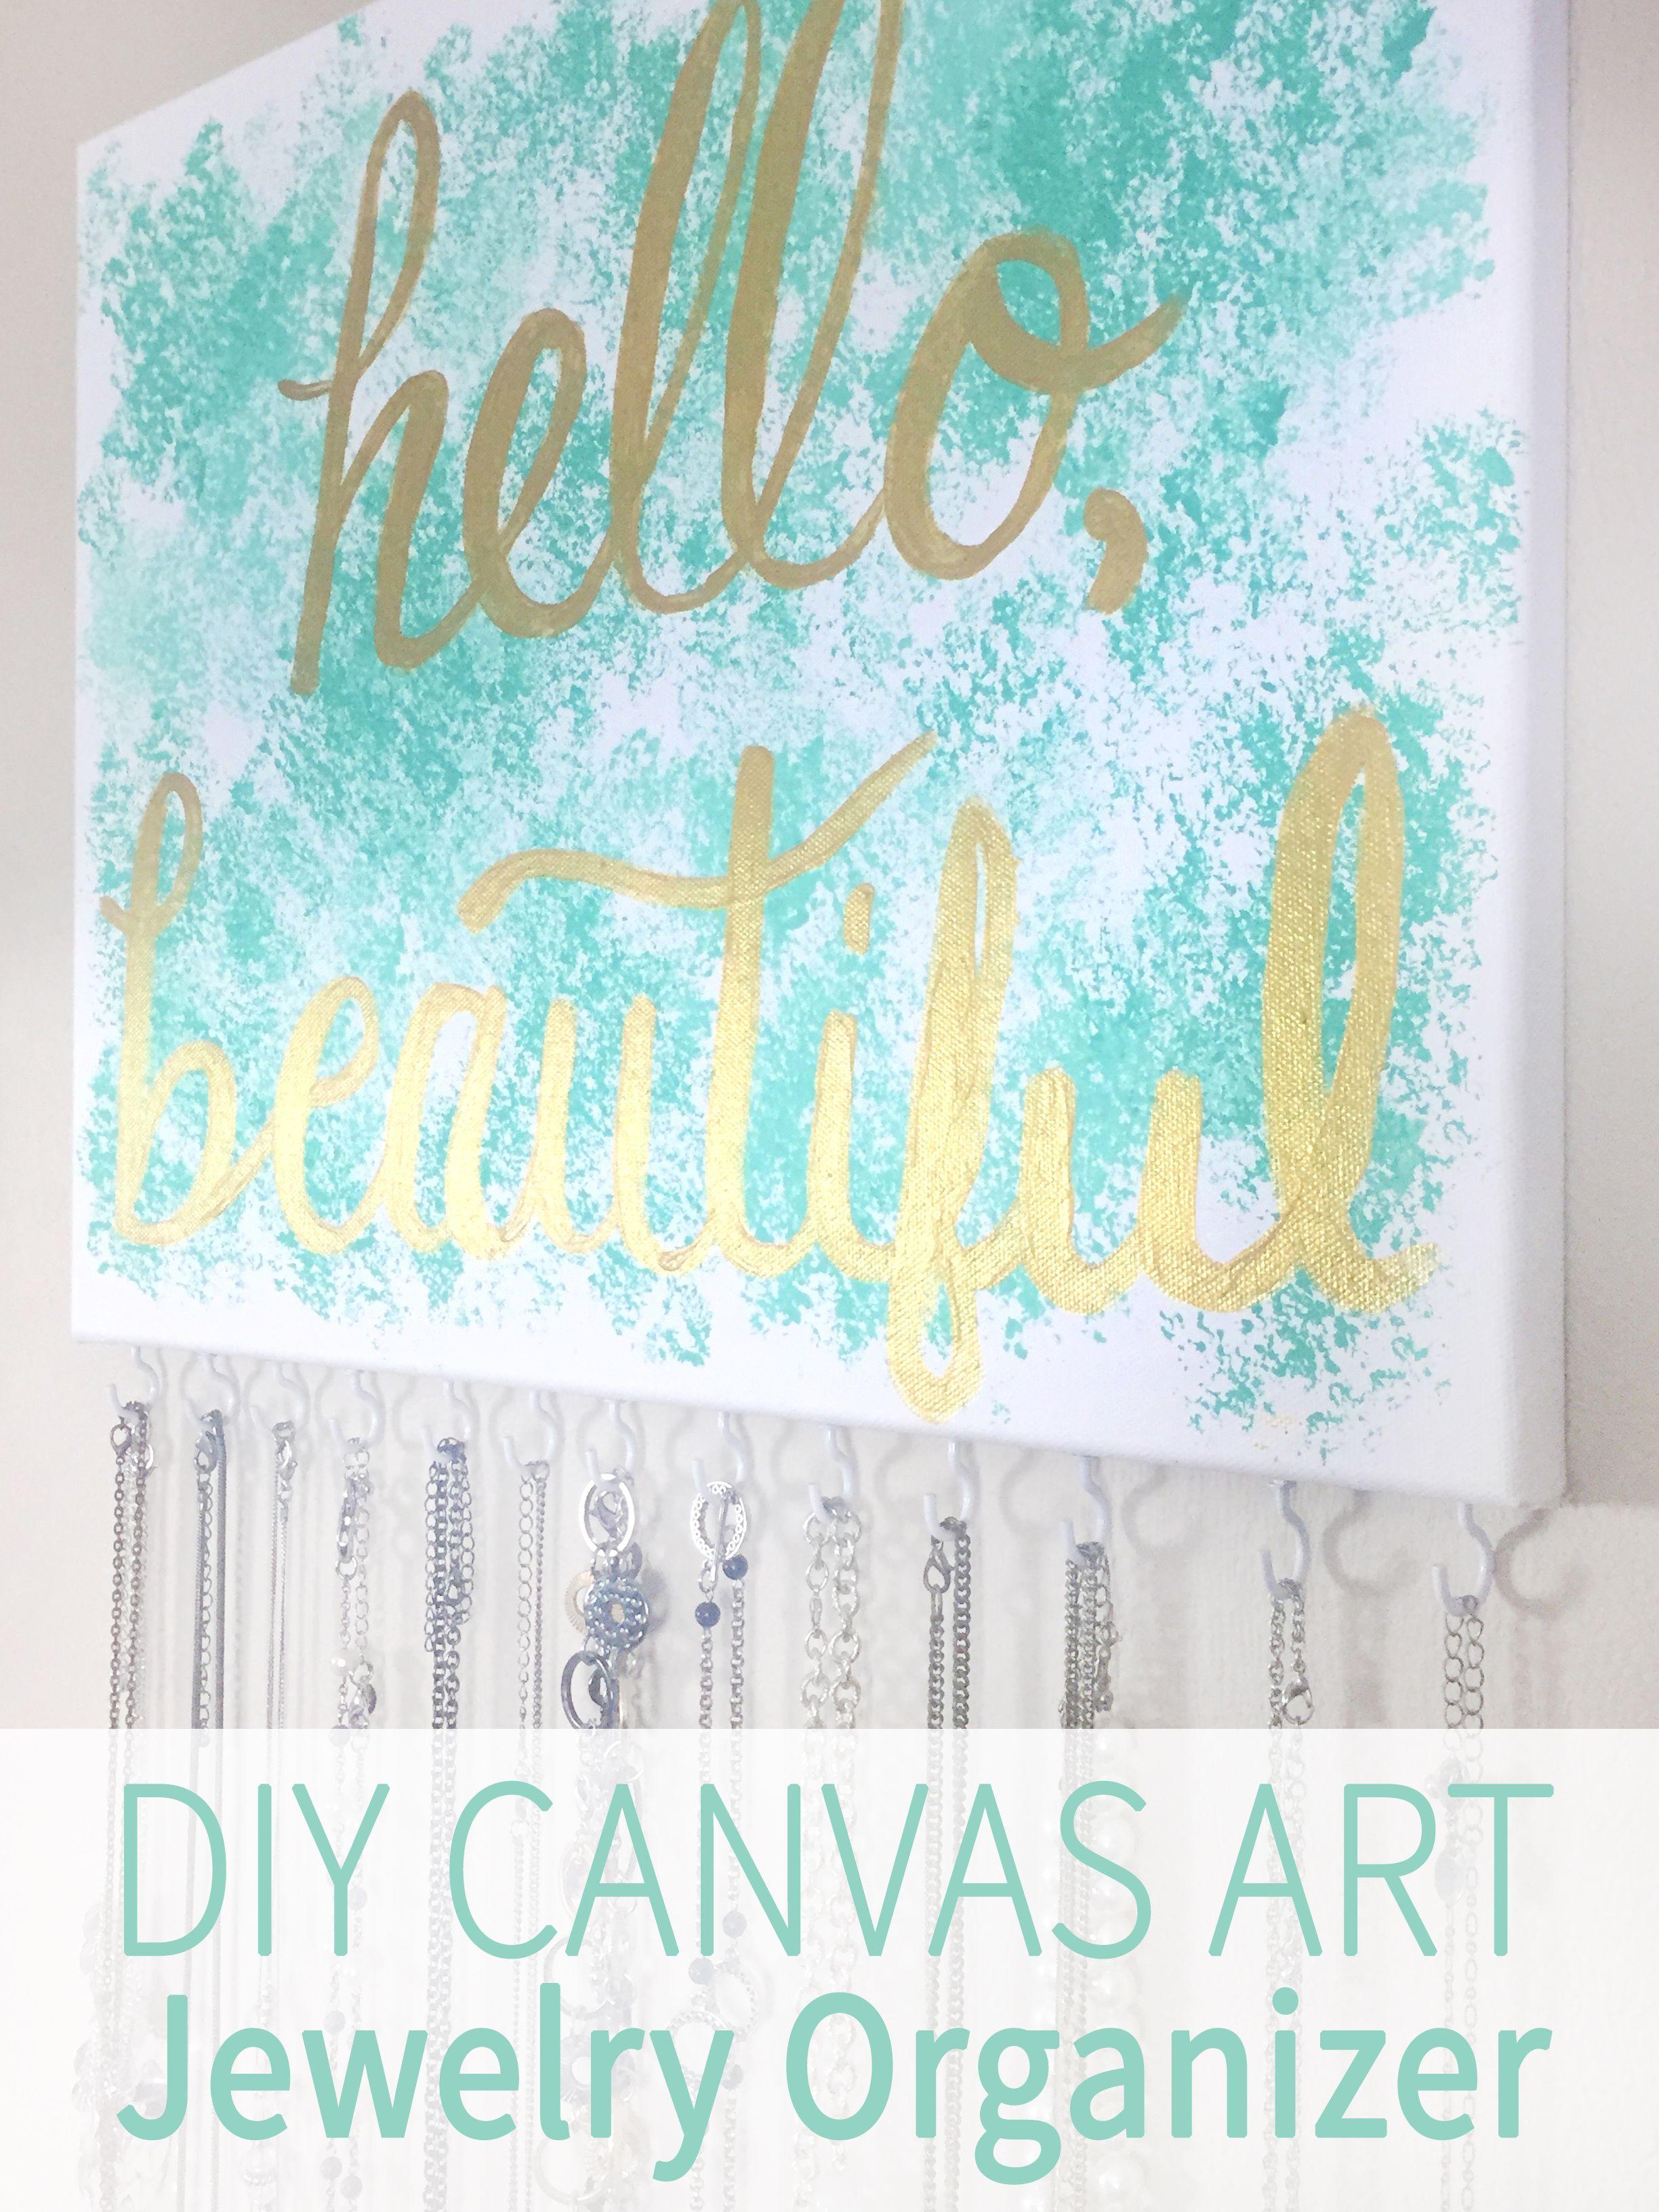 DIY Canvas Jewelry Organizer Art GIVEAWAY Organization Style